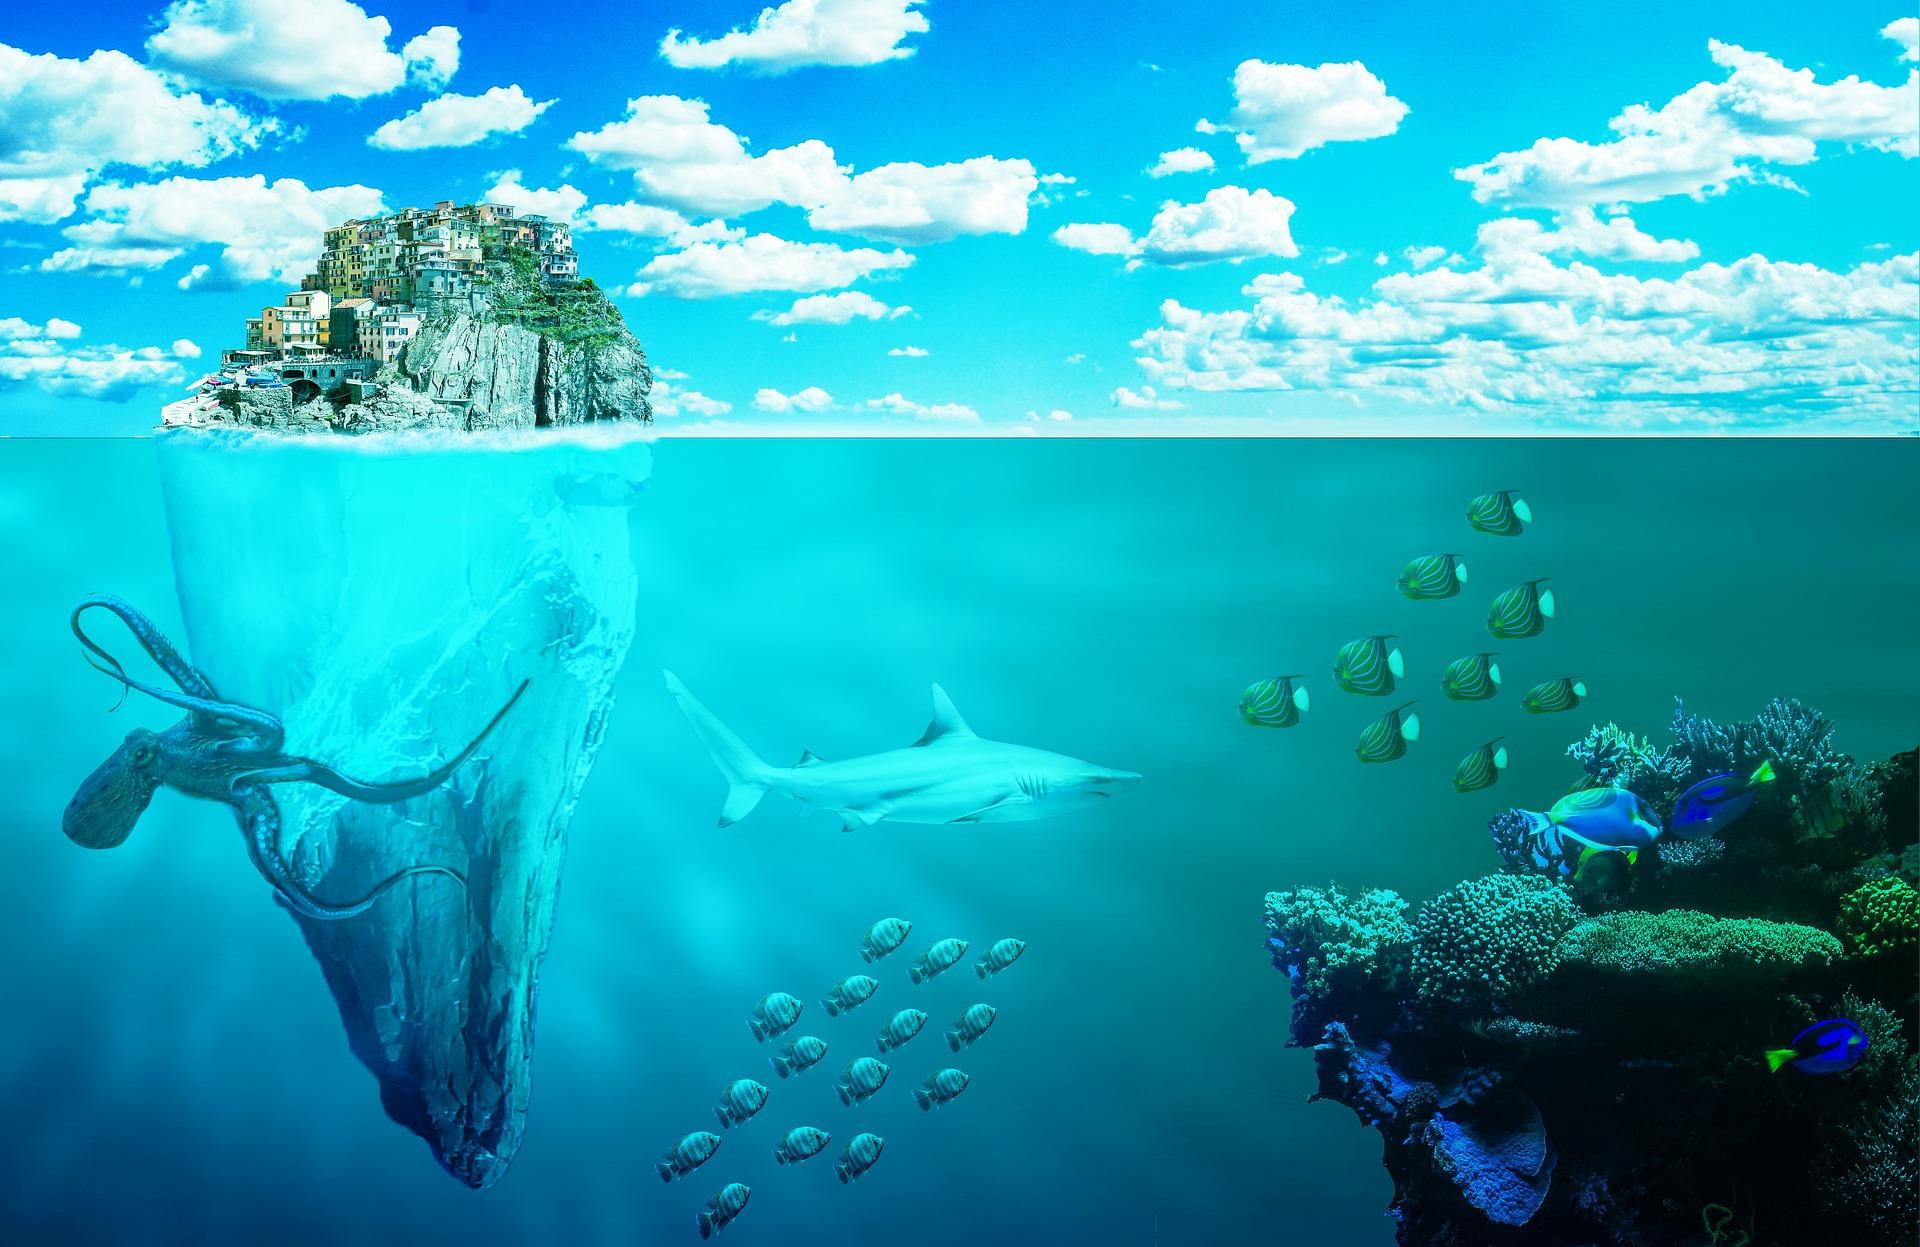 sea-ecosystem-small.jpg